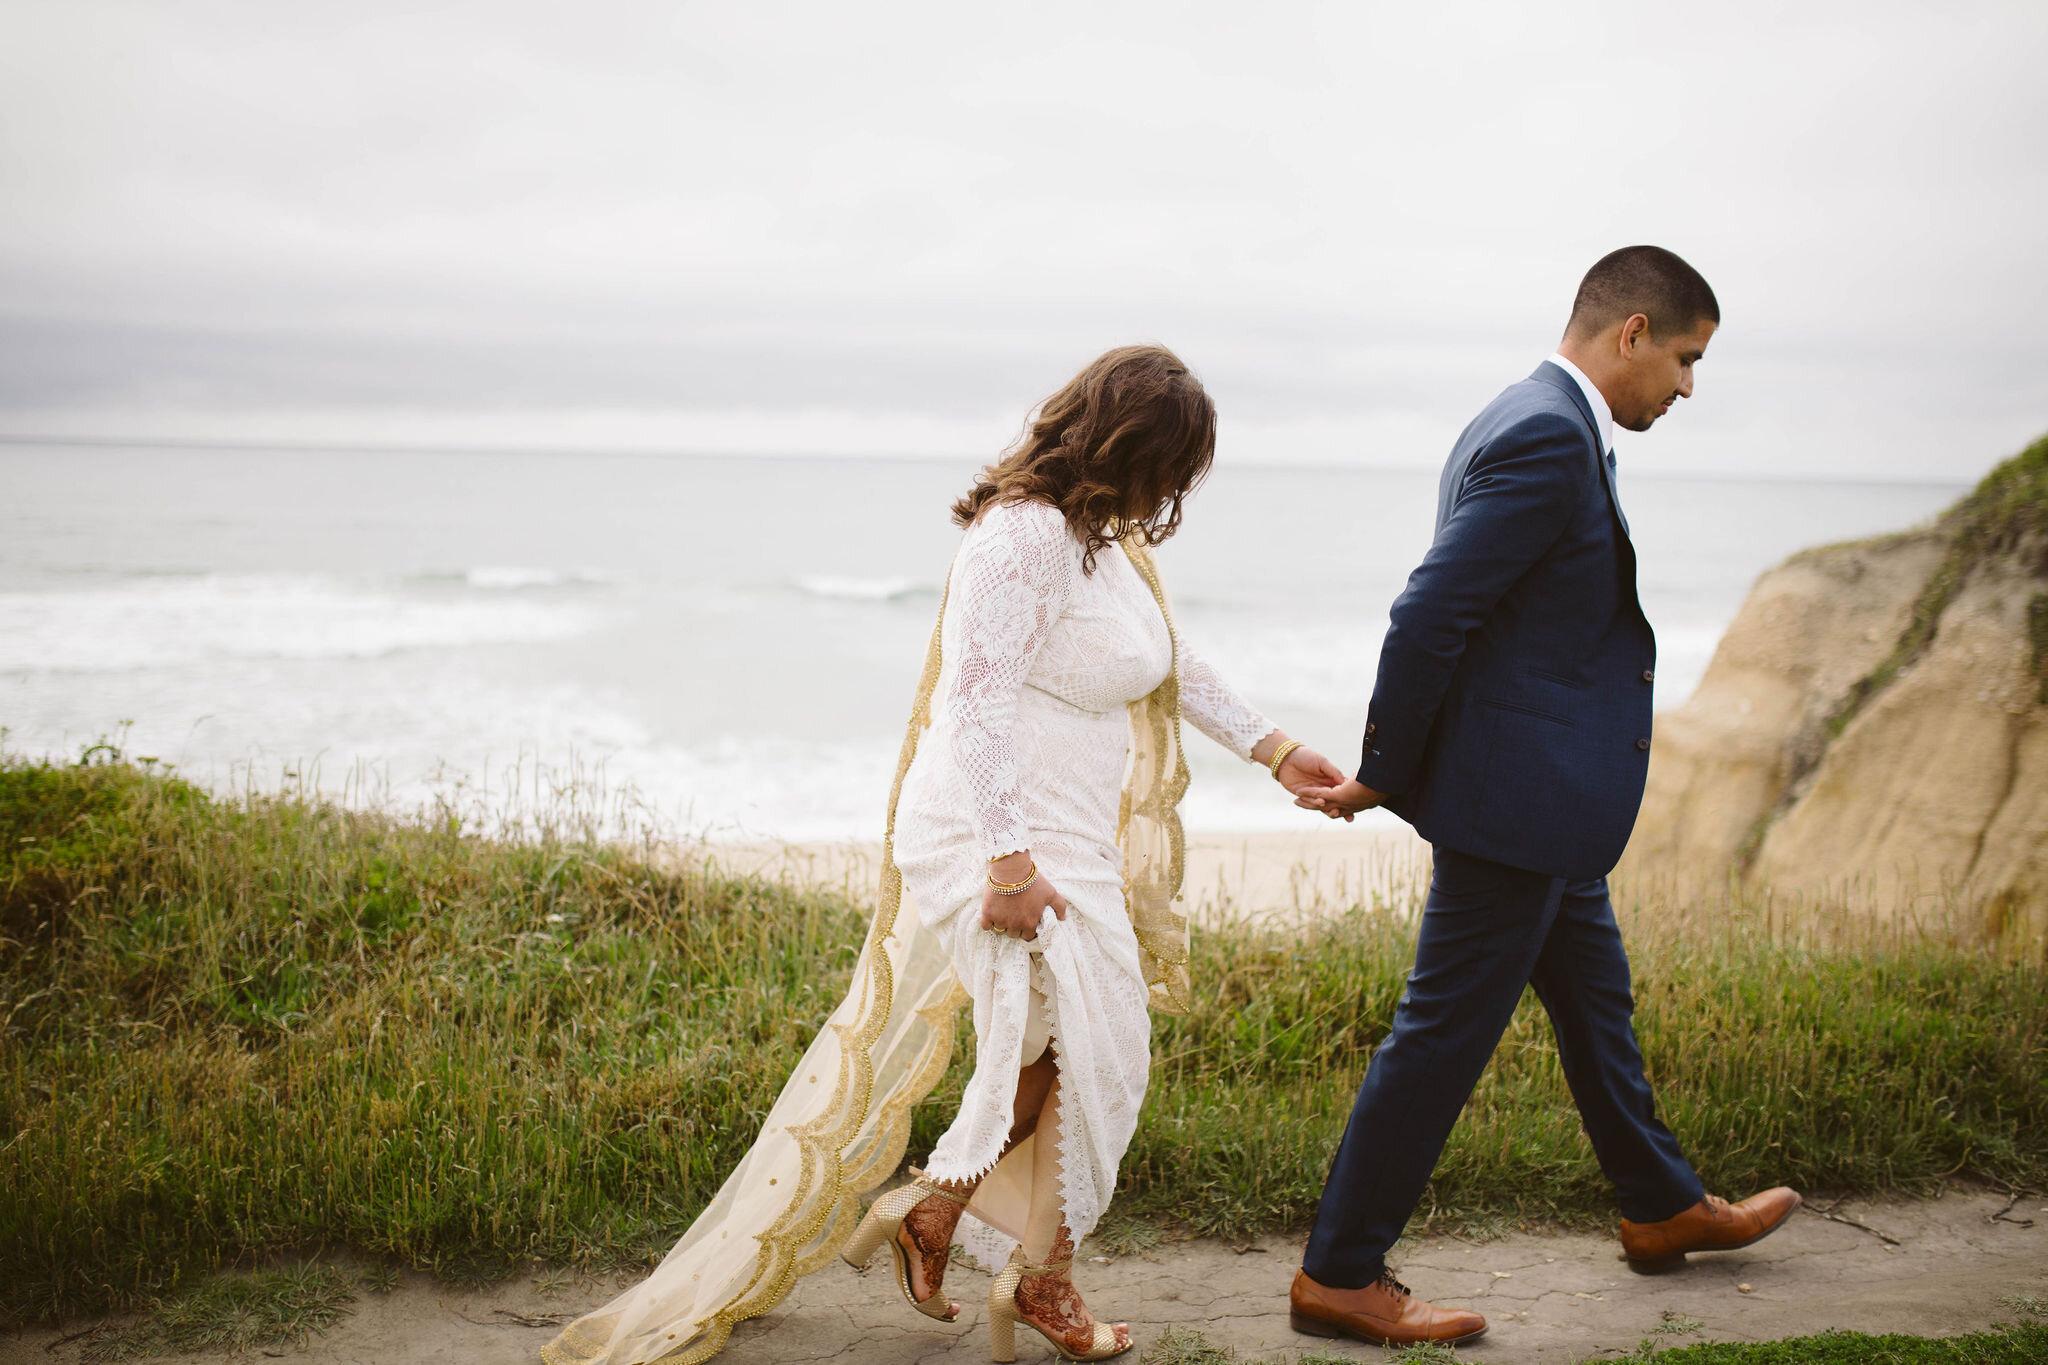 Venture-Retreat-Center-Wedding-Pescadero-Sat-Aaron-Pritam-The-Shalom-Imaginative-416.jpg